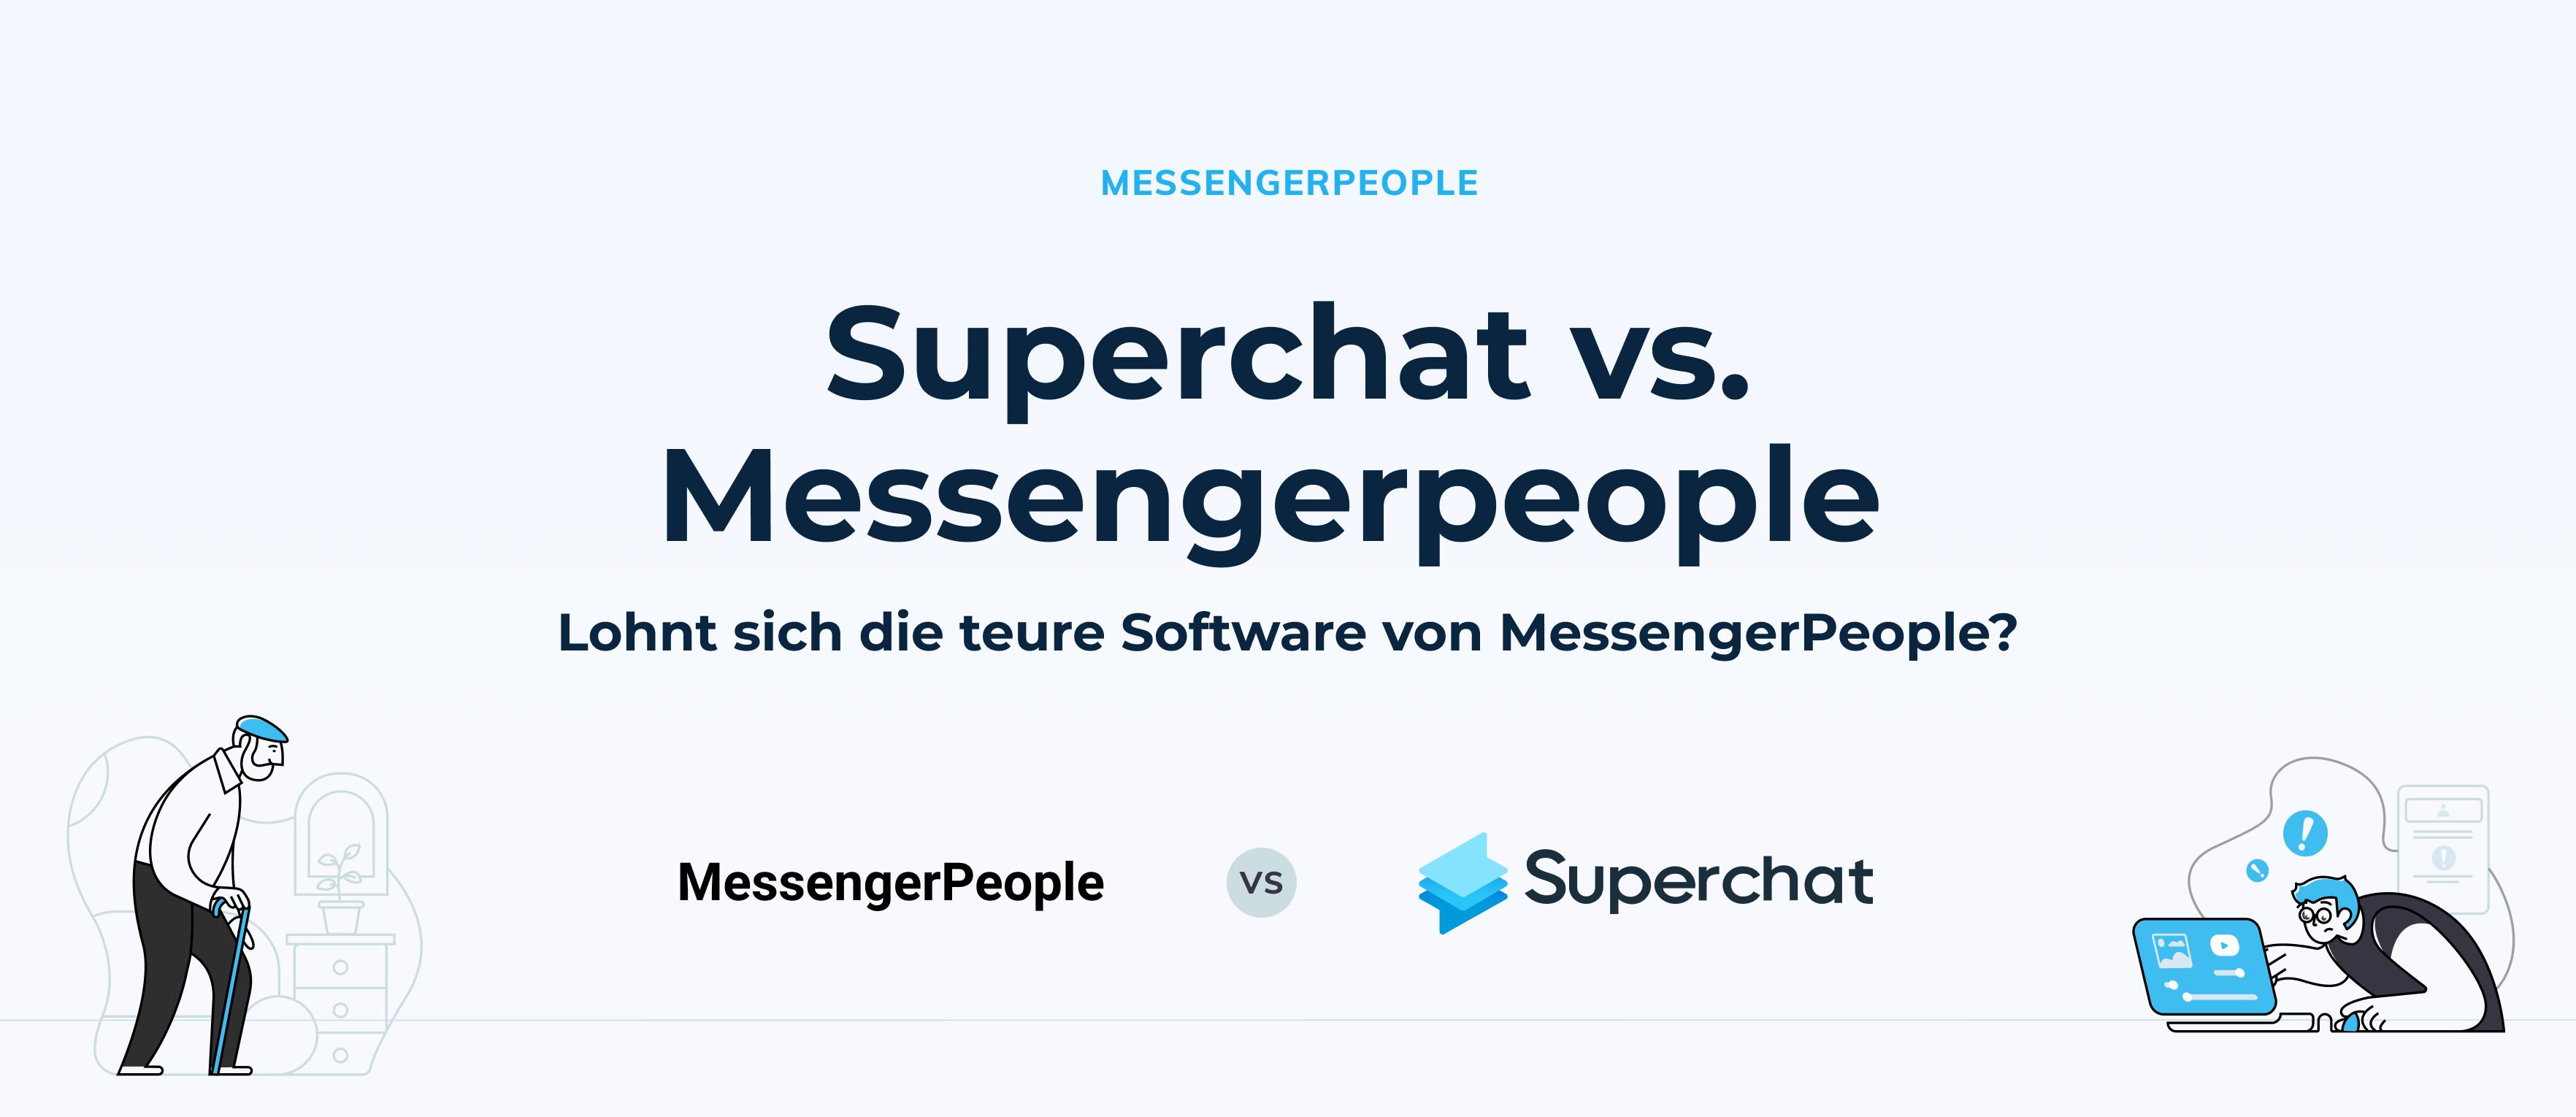 Superchat im Vergleich: Superchat vs. MessengerPeople